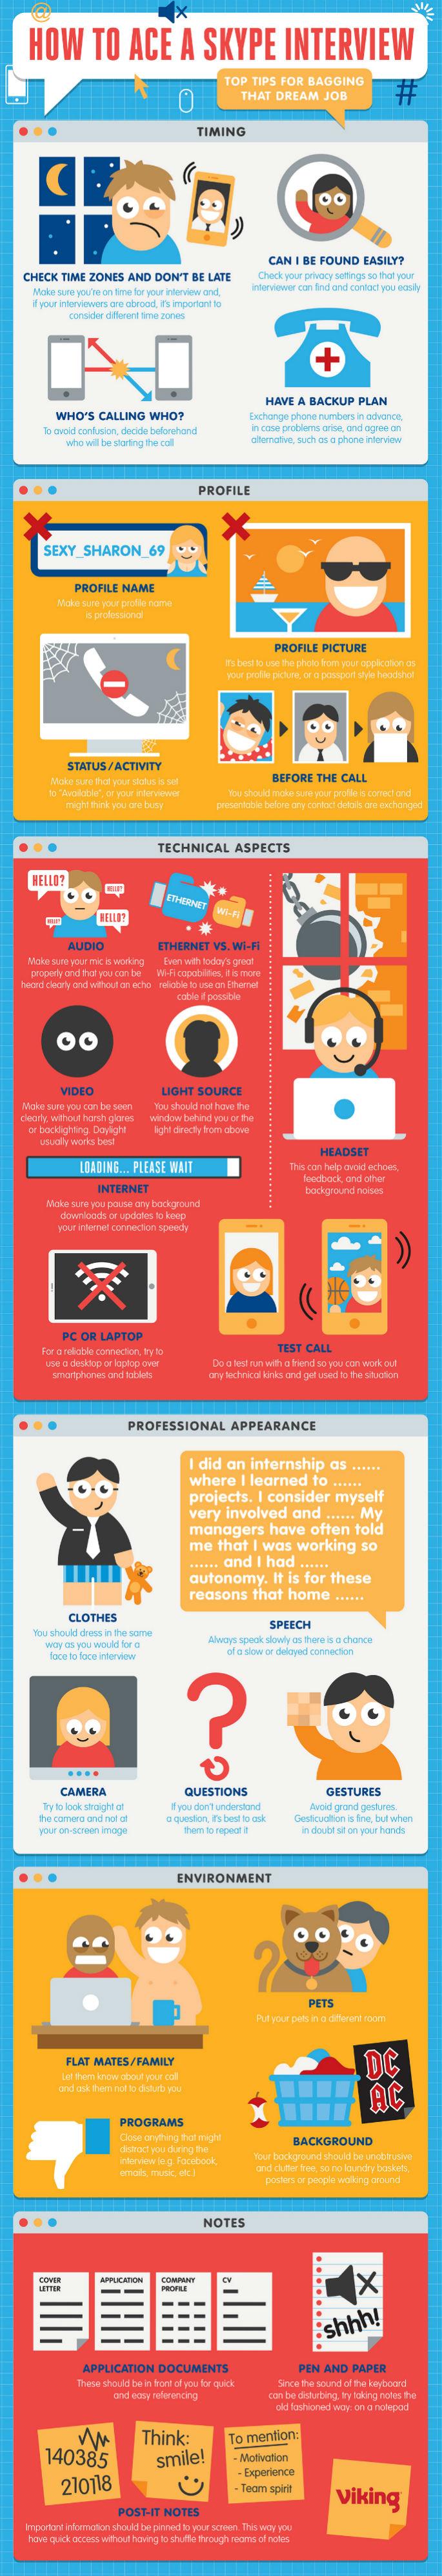 Skype interview infographic